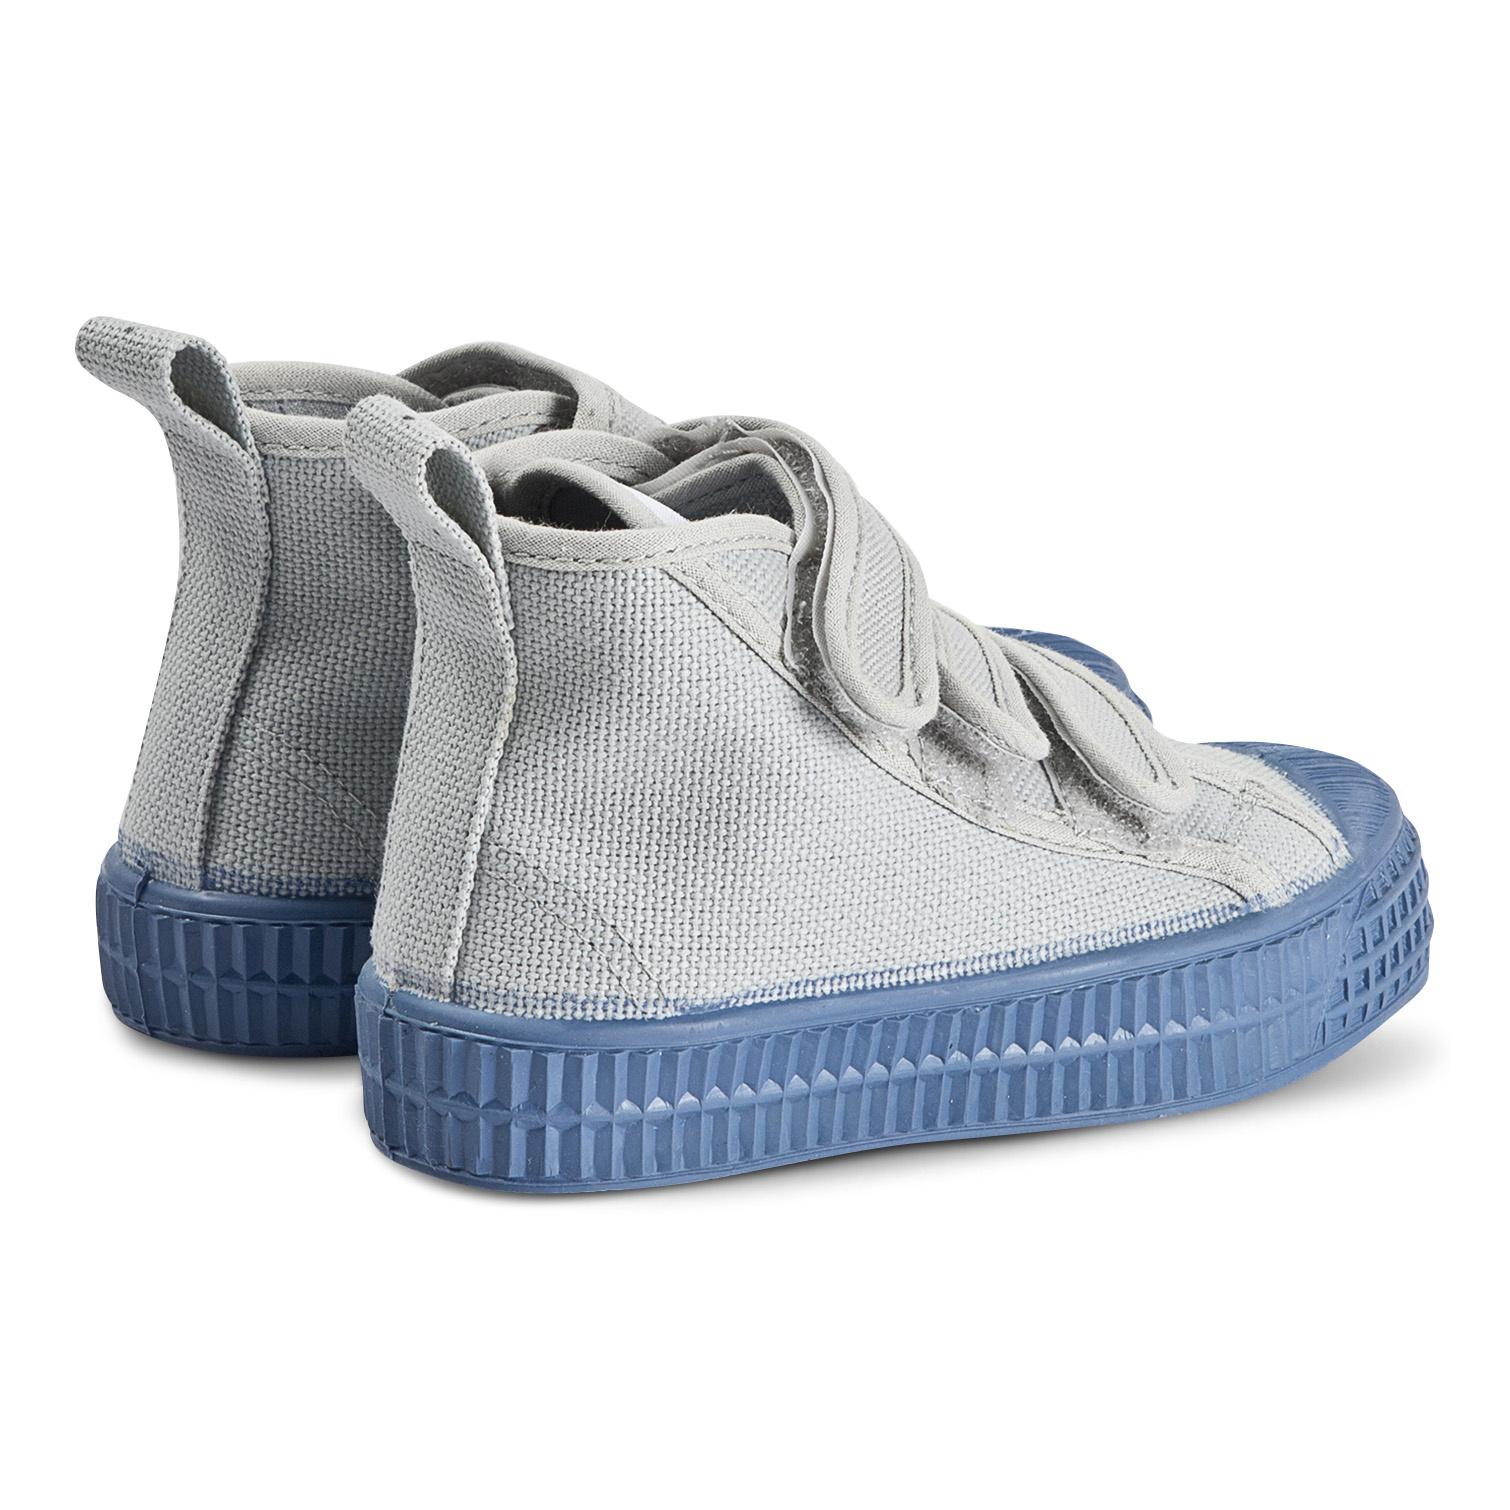 STAR DRIBBLE KID - Grey / Blue-3